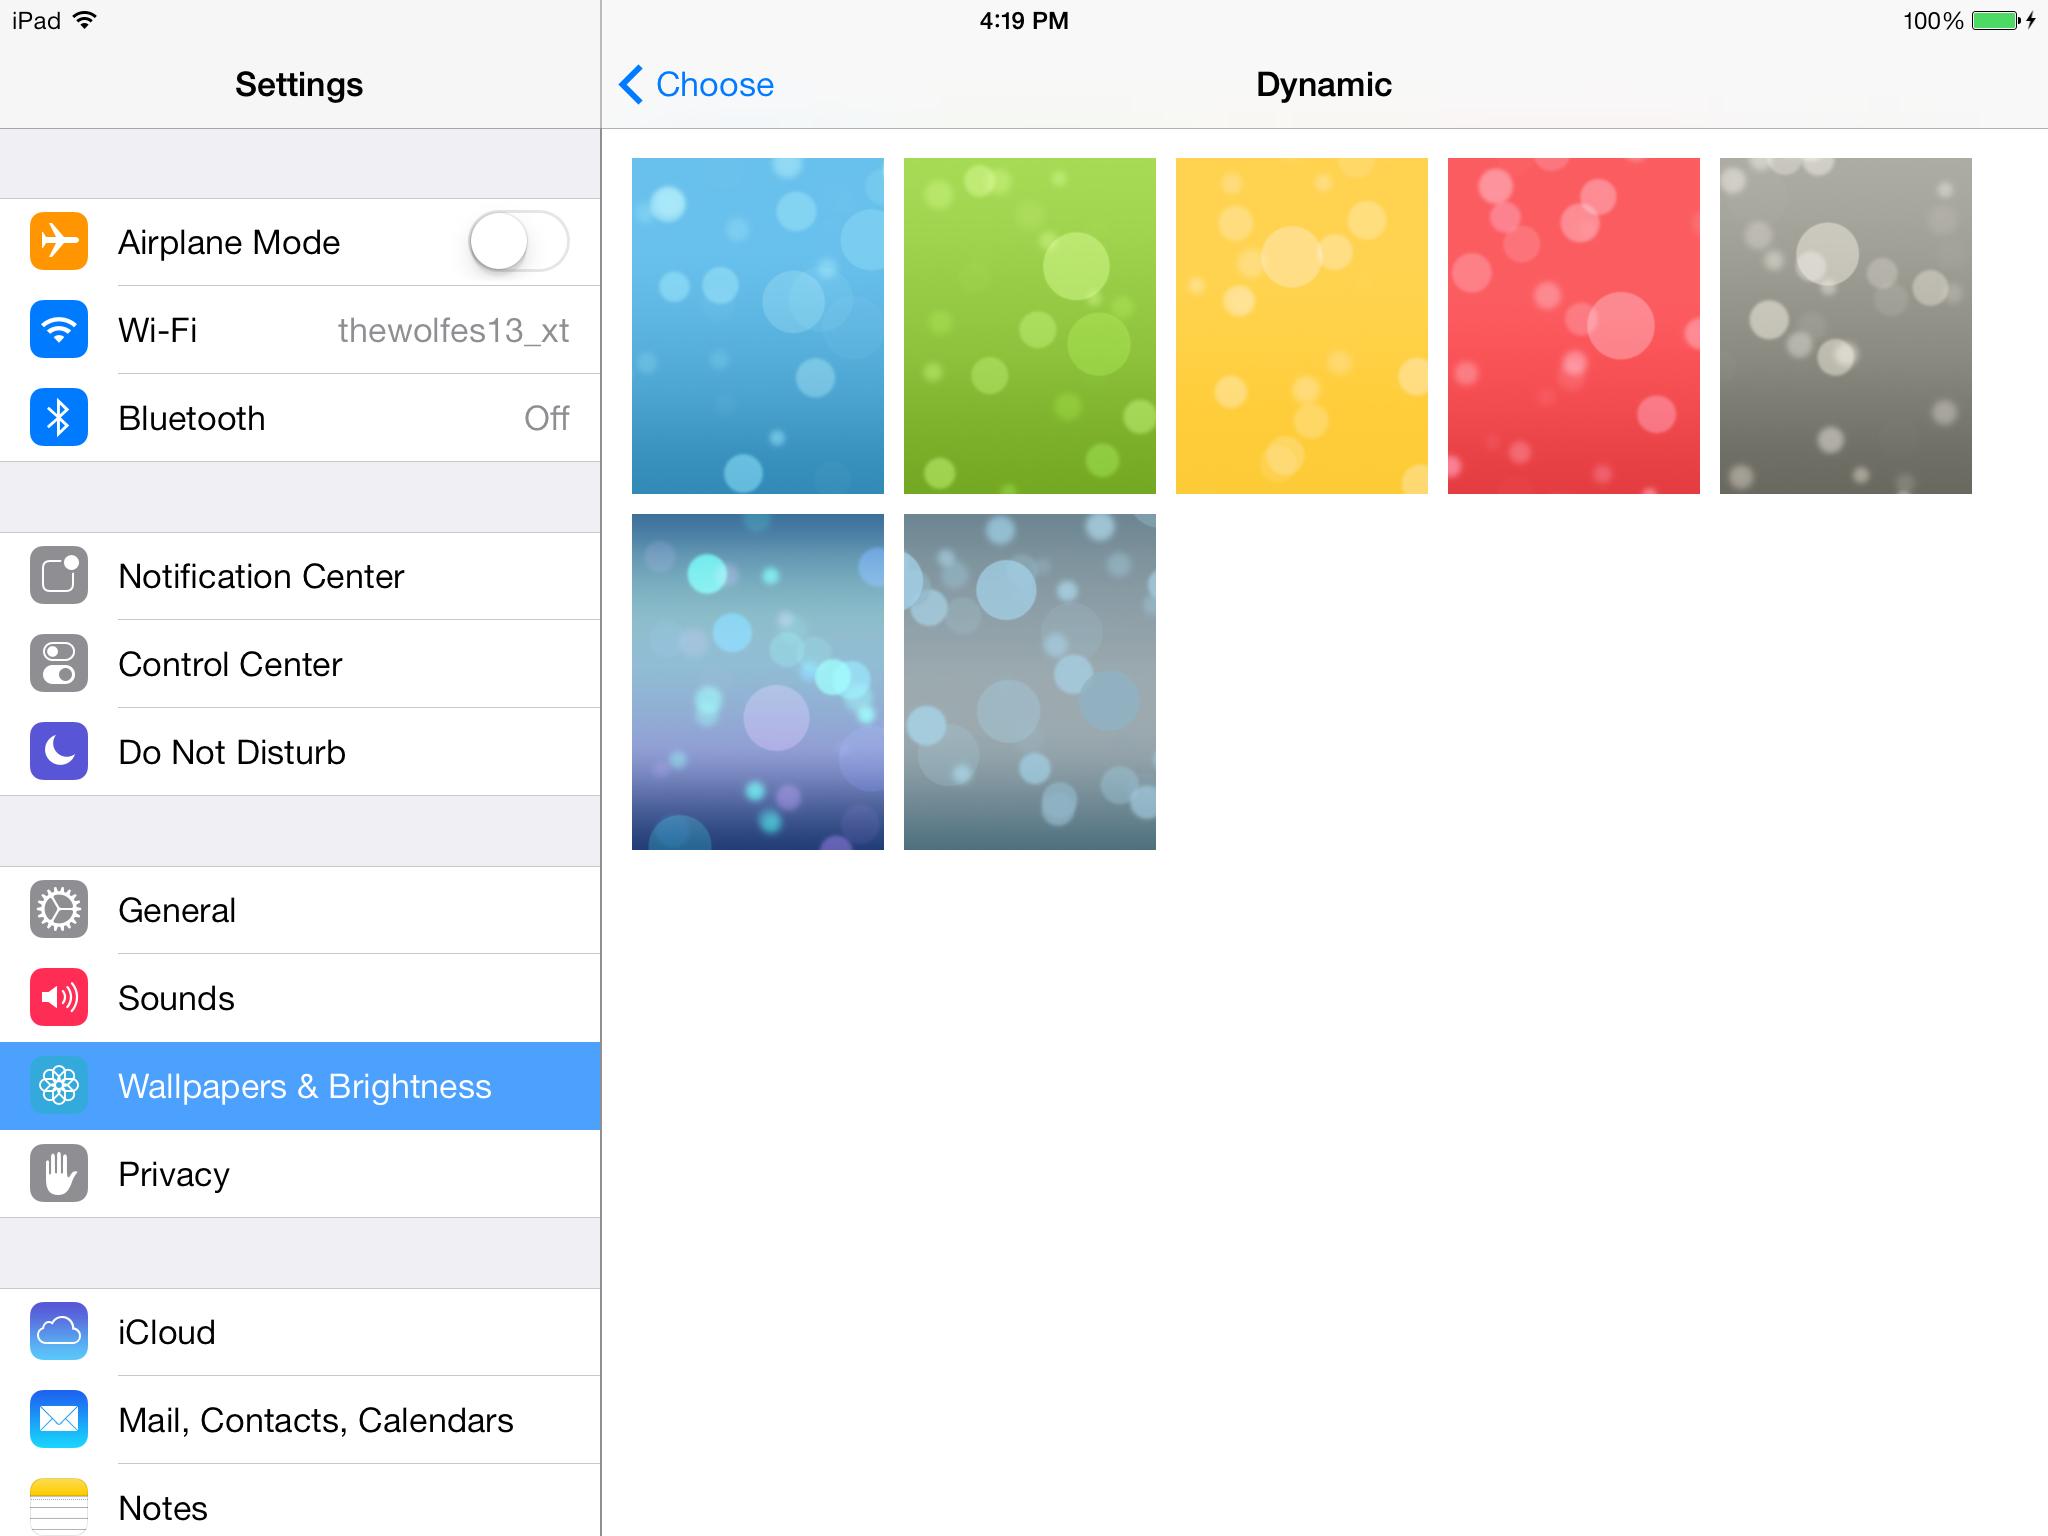 GifMill - Новости Apple. Все о Mac 24